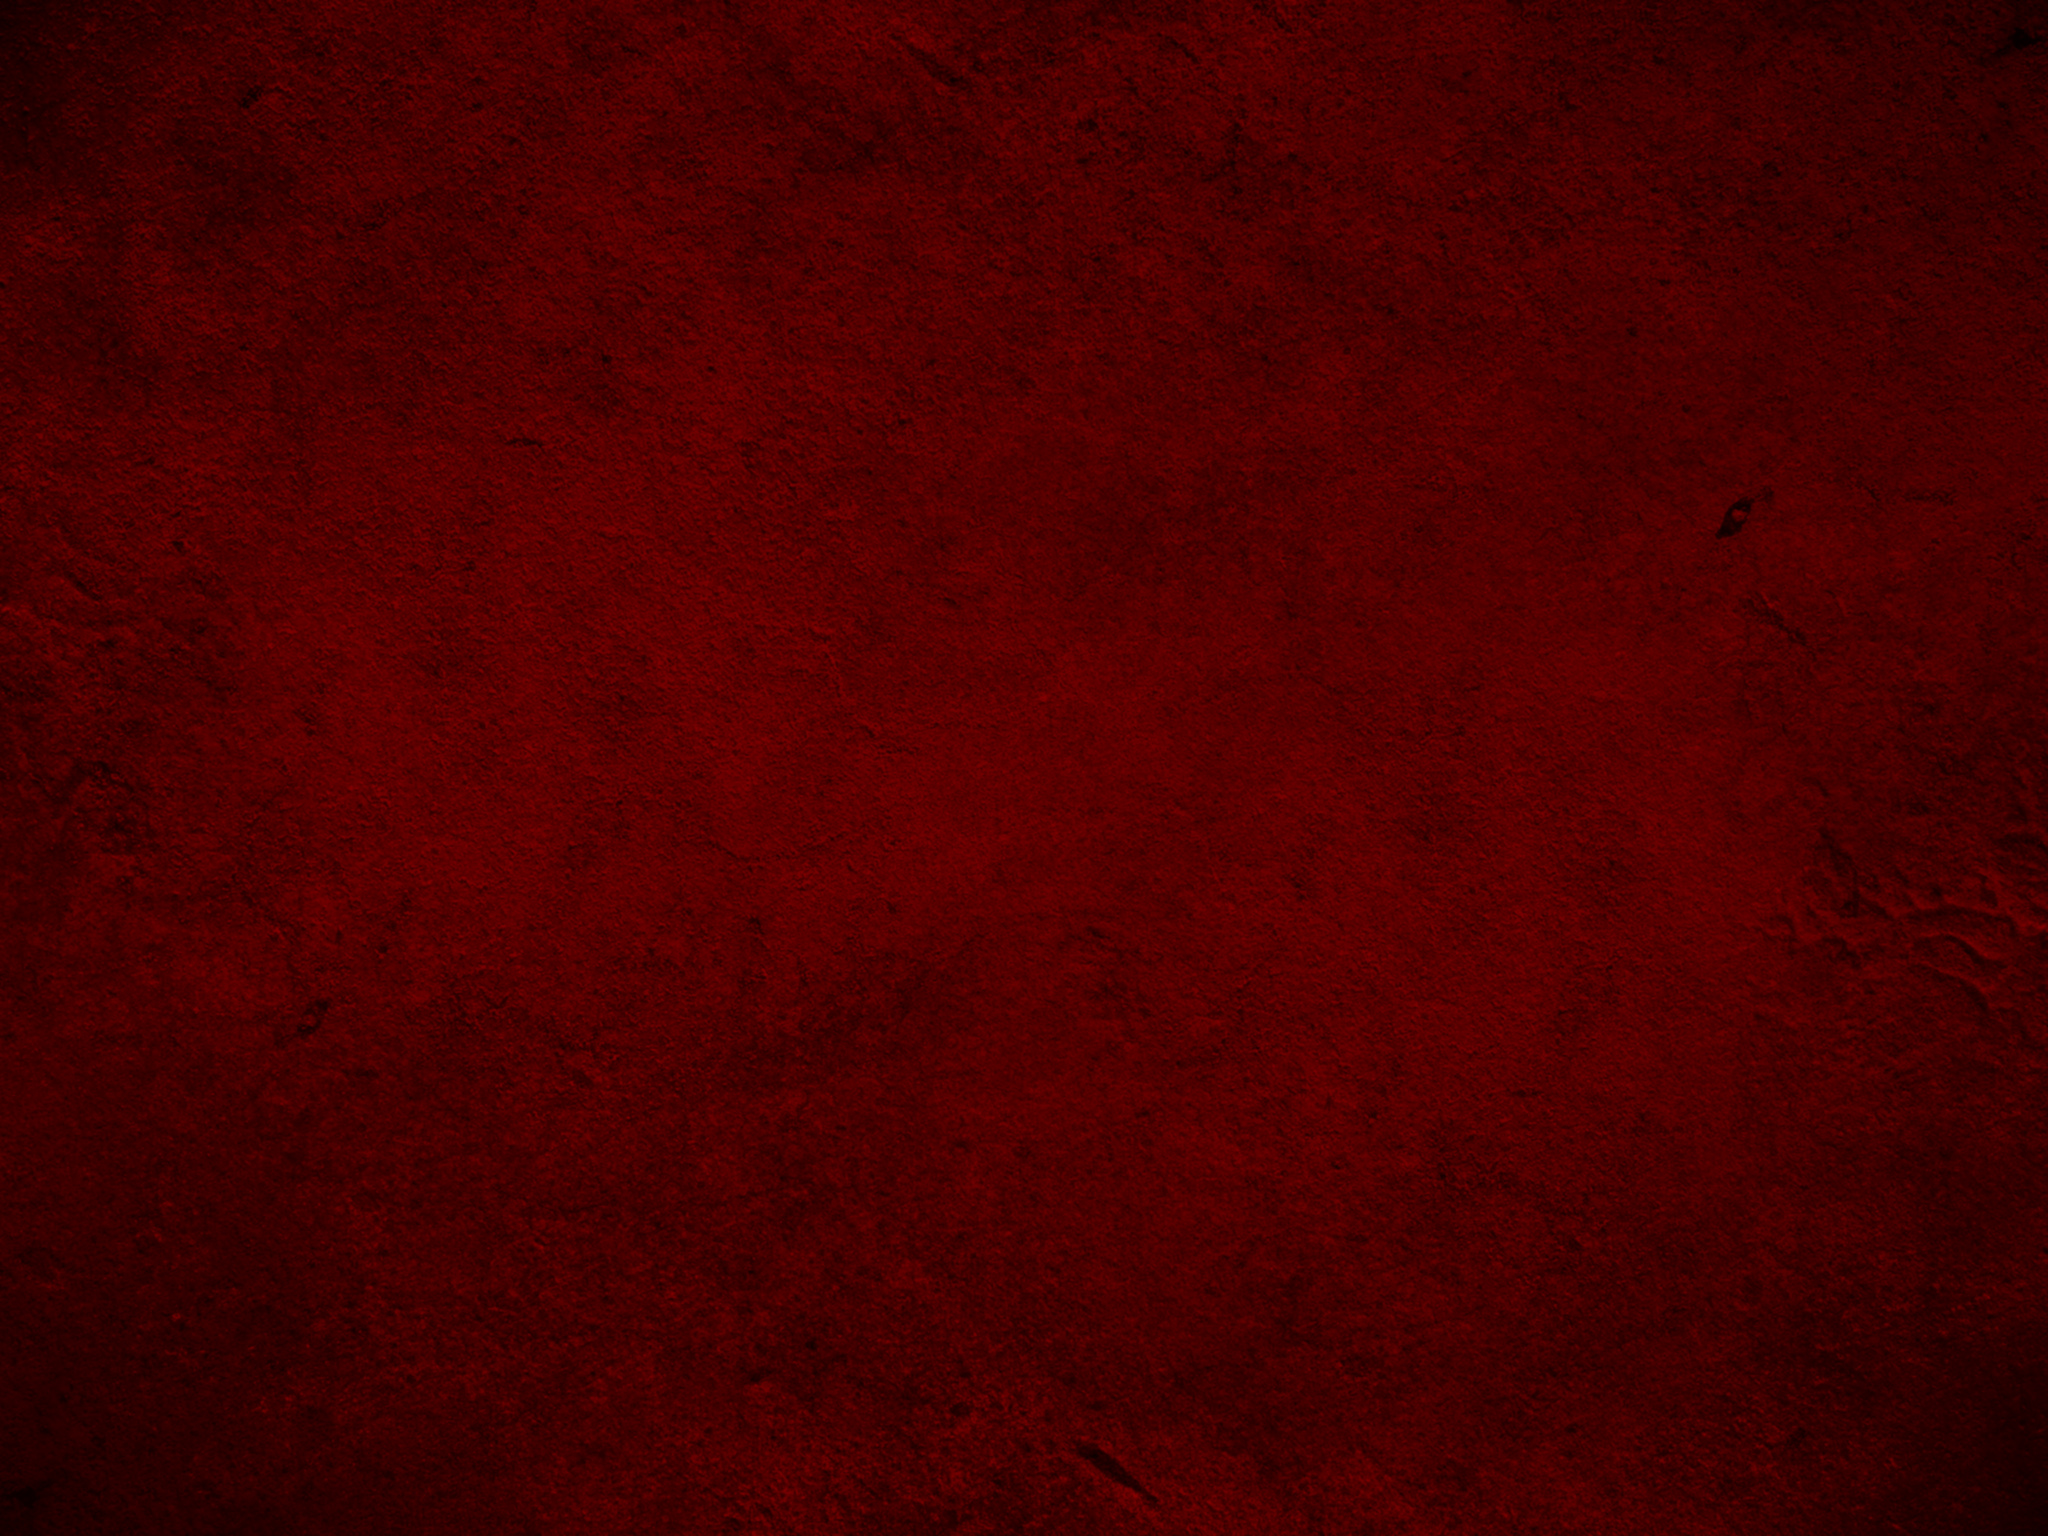 71+] Textured Red Wallpaper on WallpaperSafari